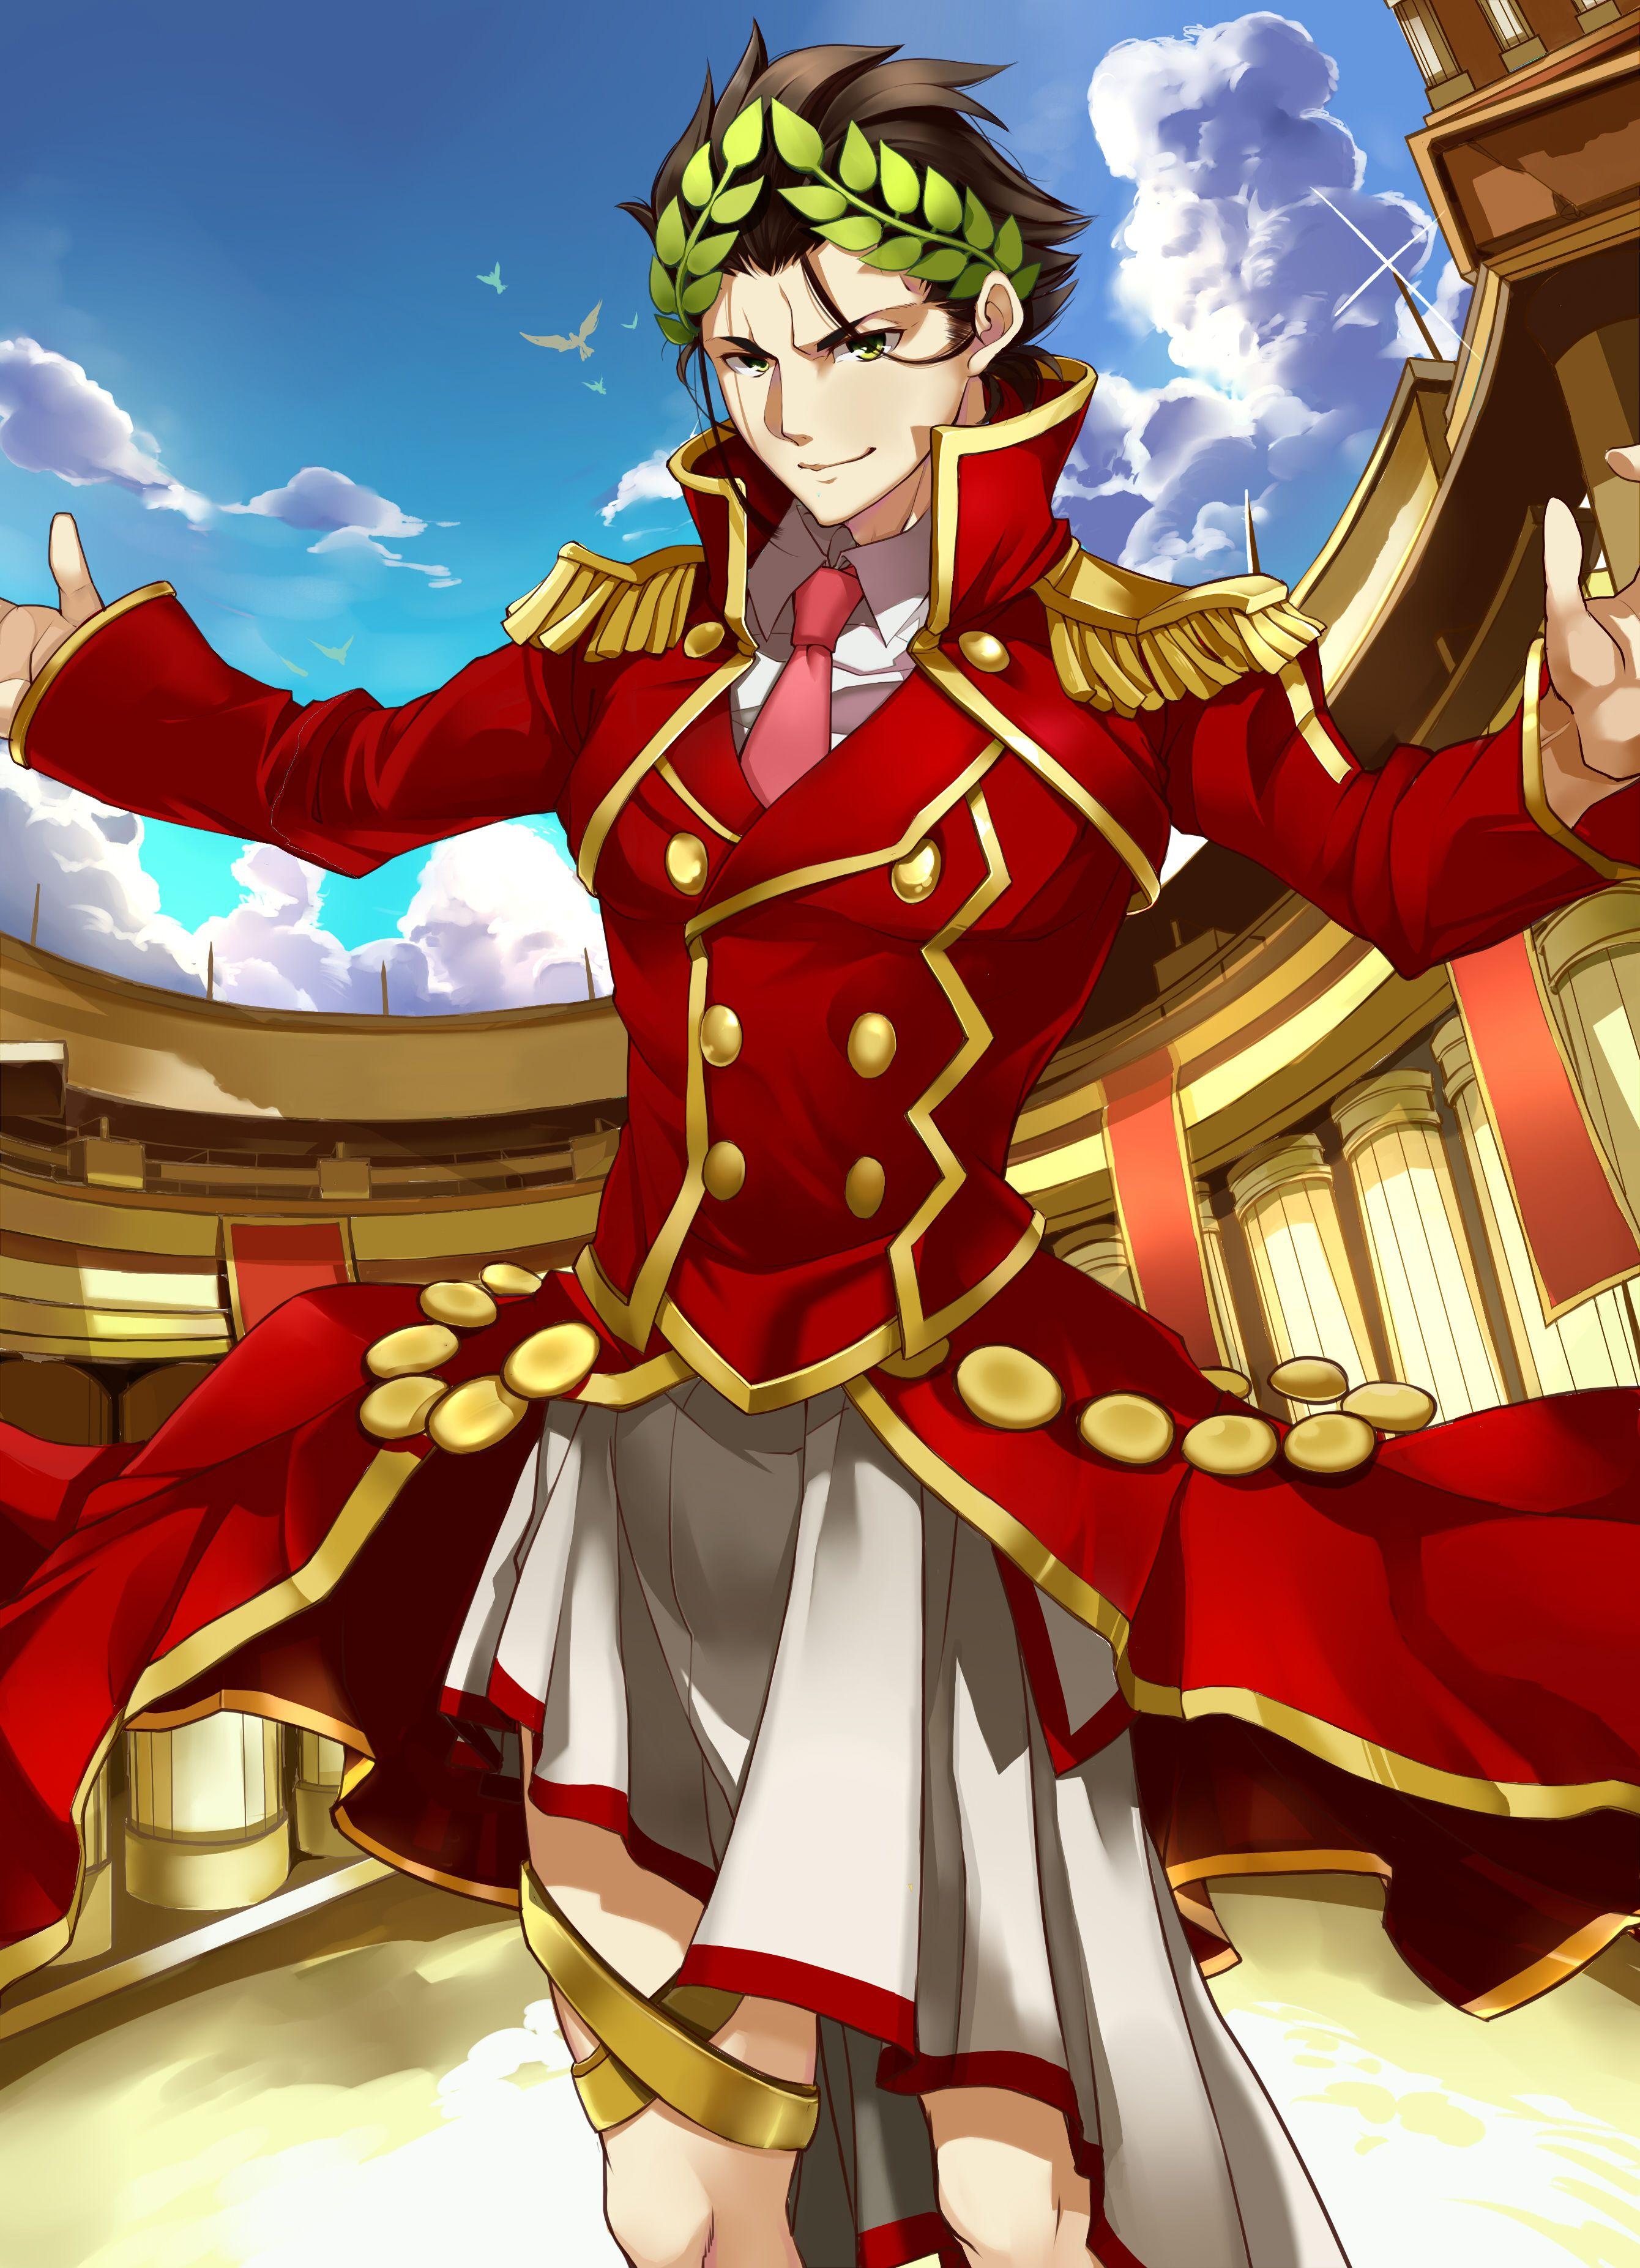 Gaius Julius Caesar【Fate/Grand Order】 | Fate anime series, Fate servants,  Julius caesar